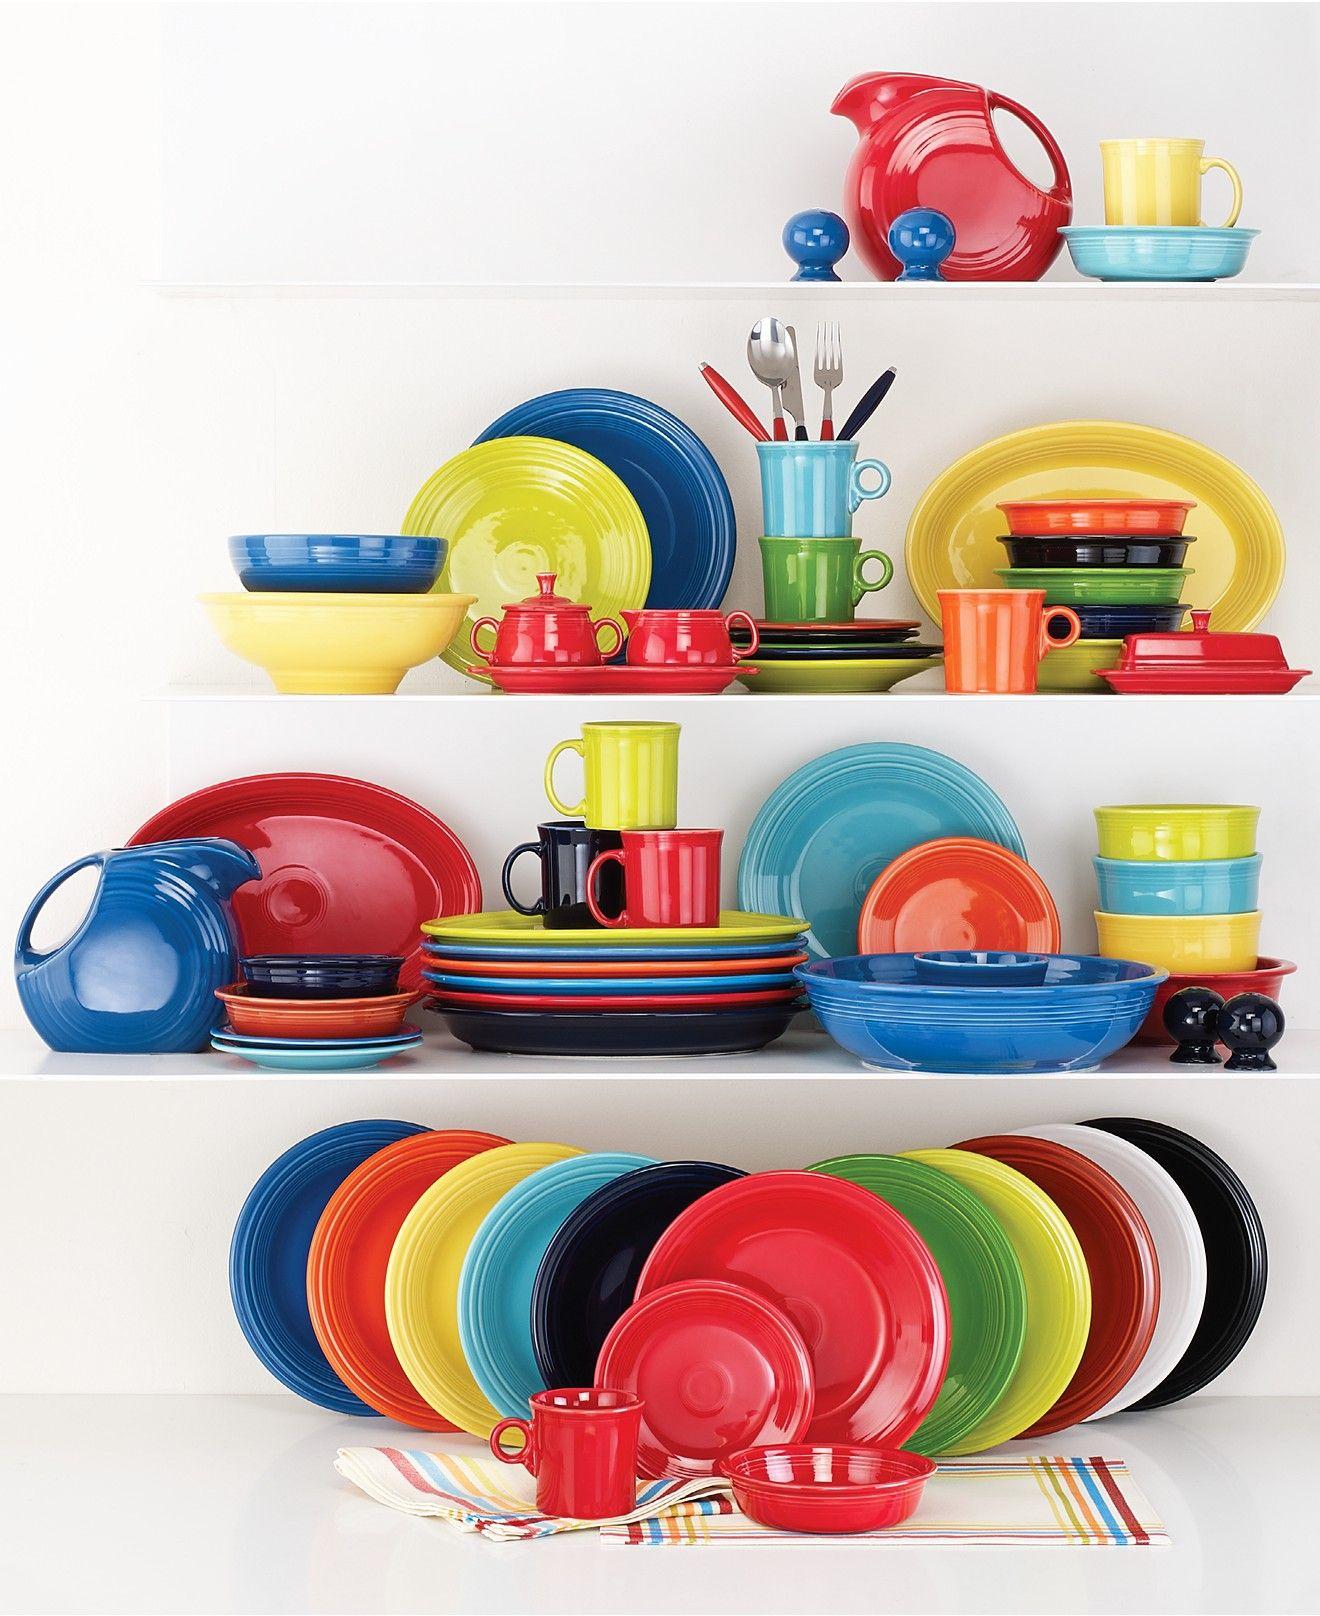 Fiesta Utensil Crock & Reviews - Dinnerware - Dining - Macy's